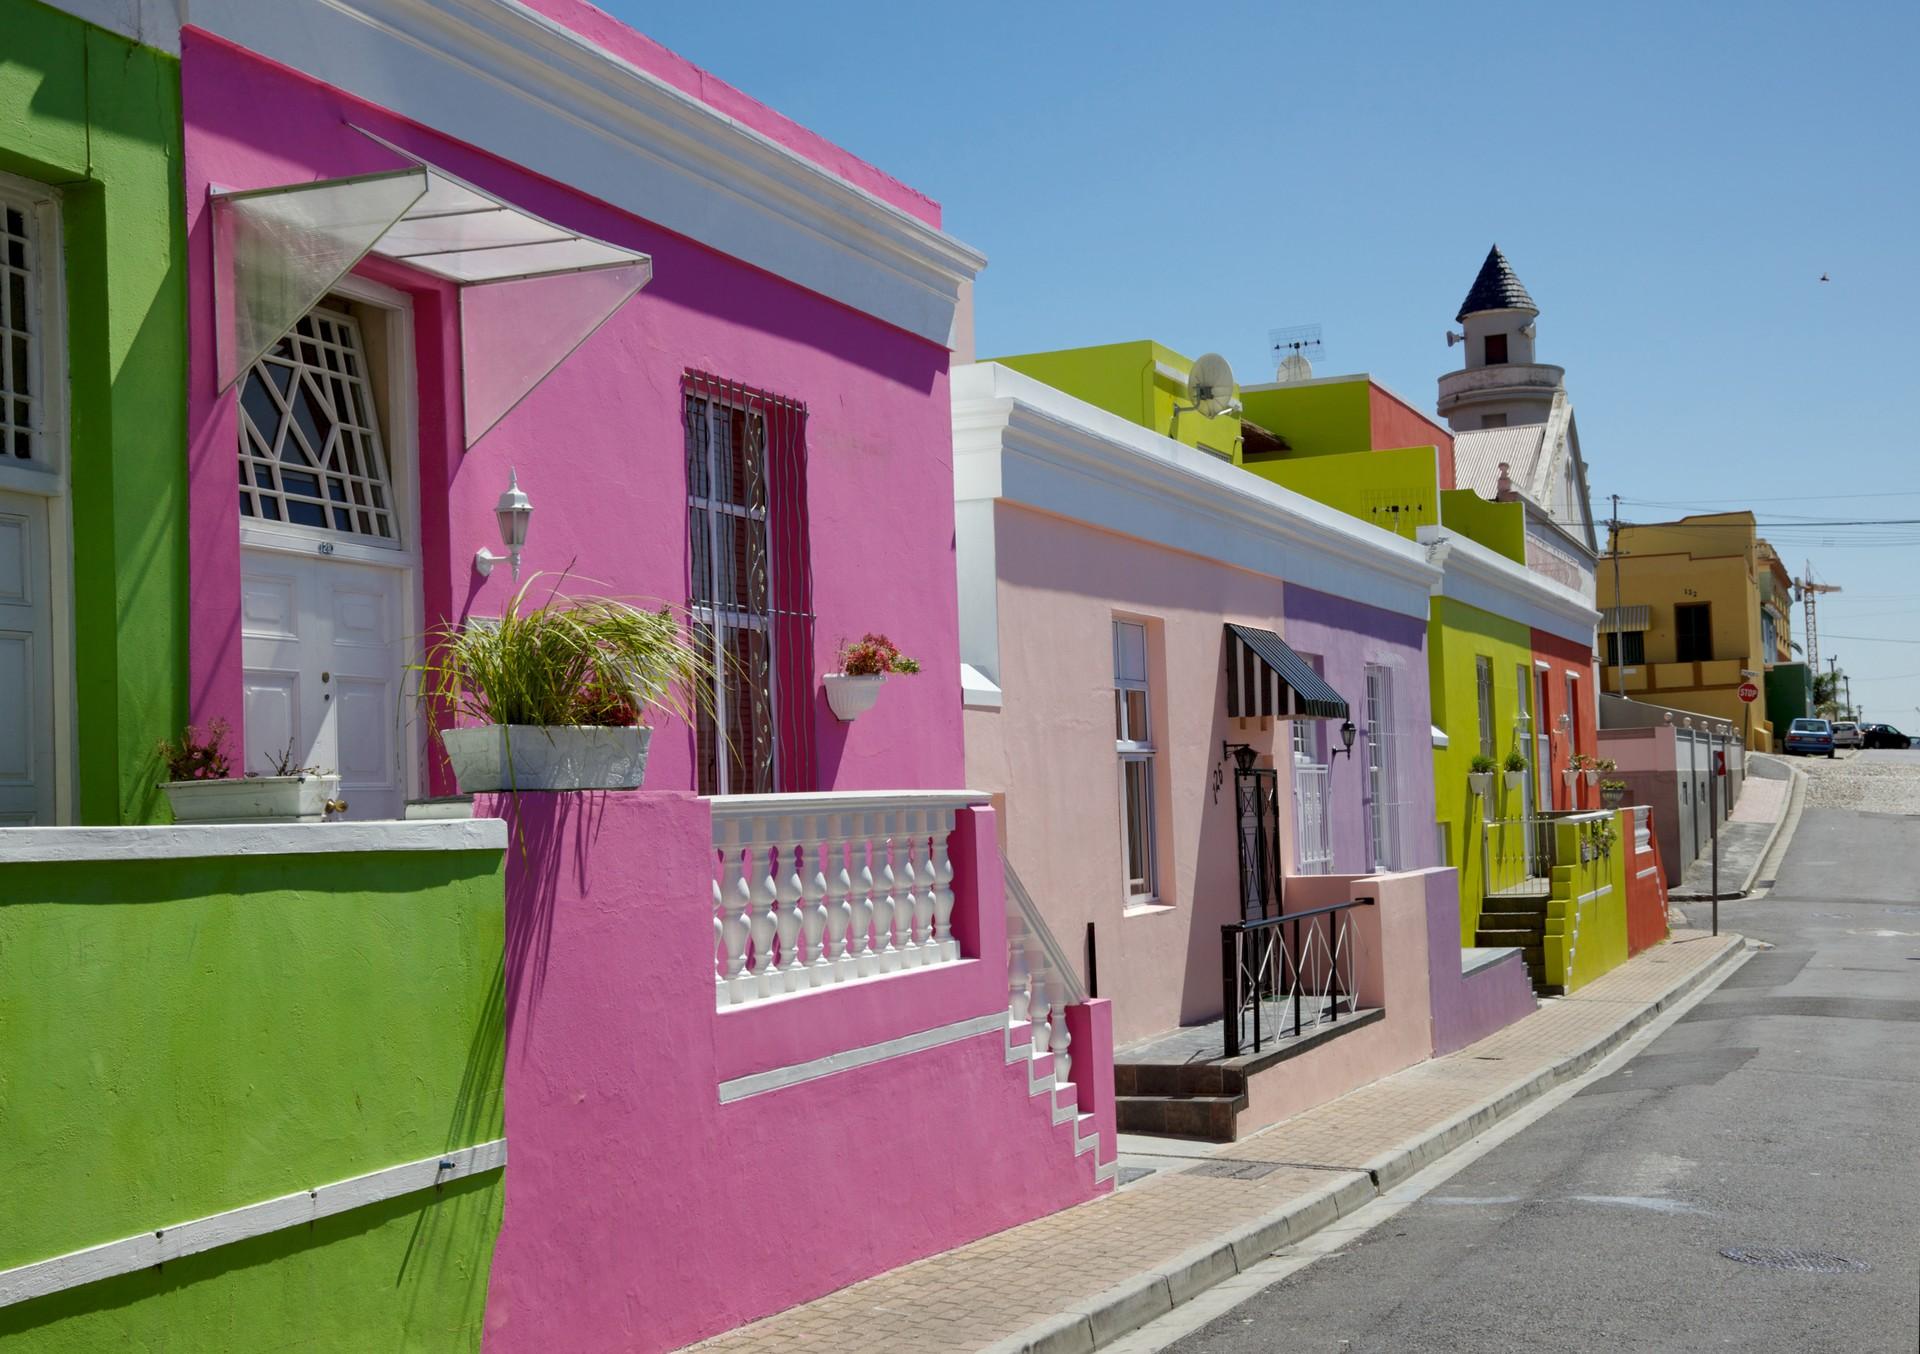 South Africa holiday - Bo Kaap neighbourhood